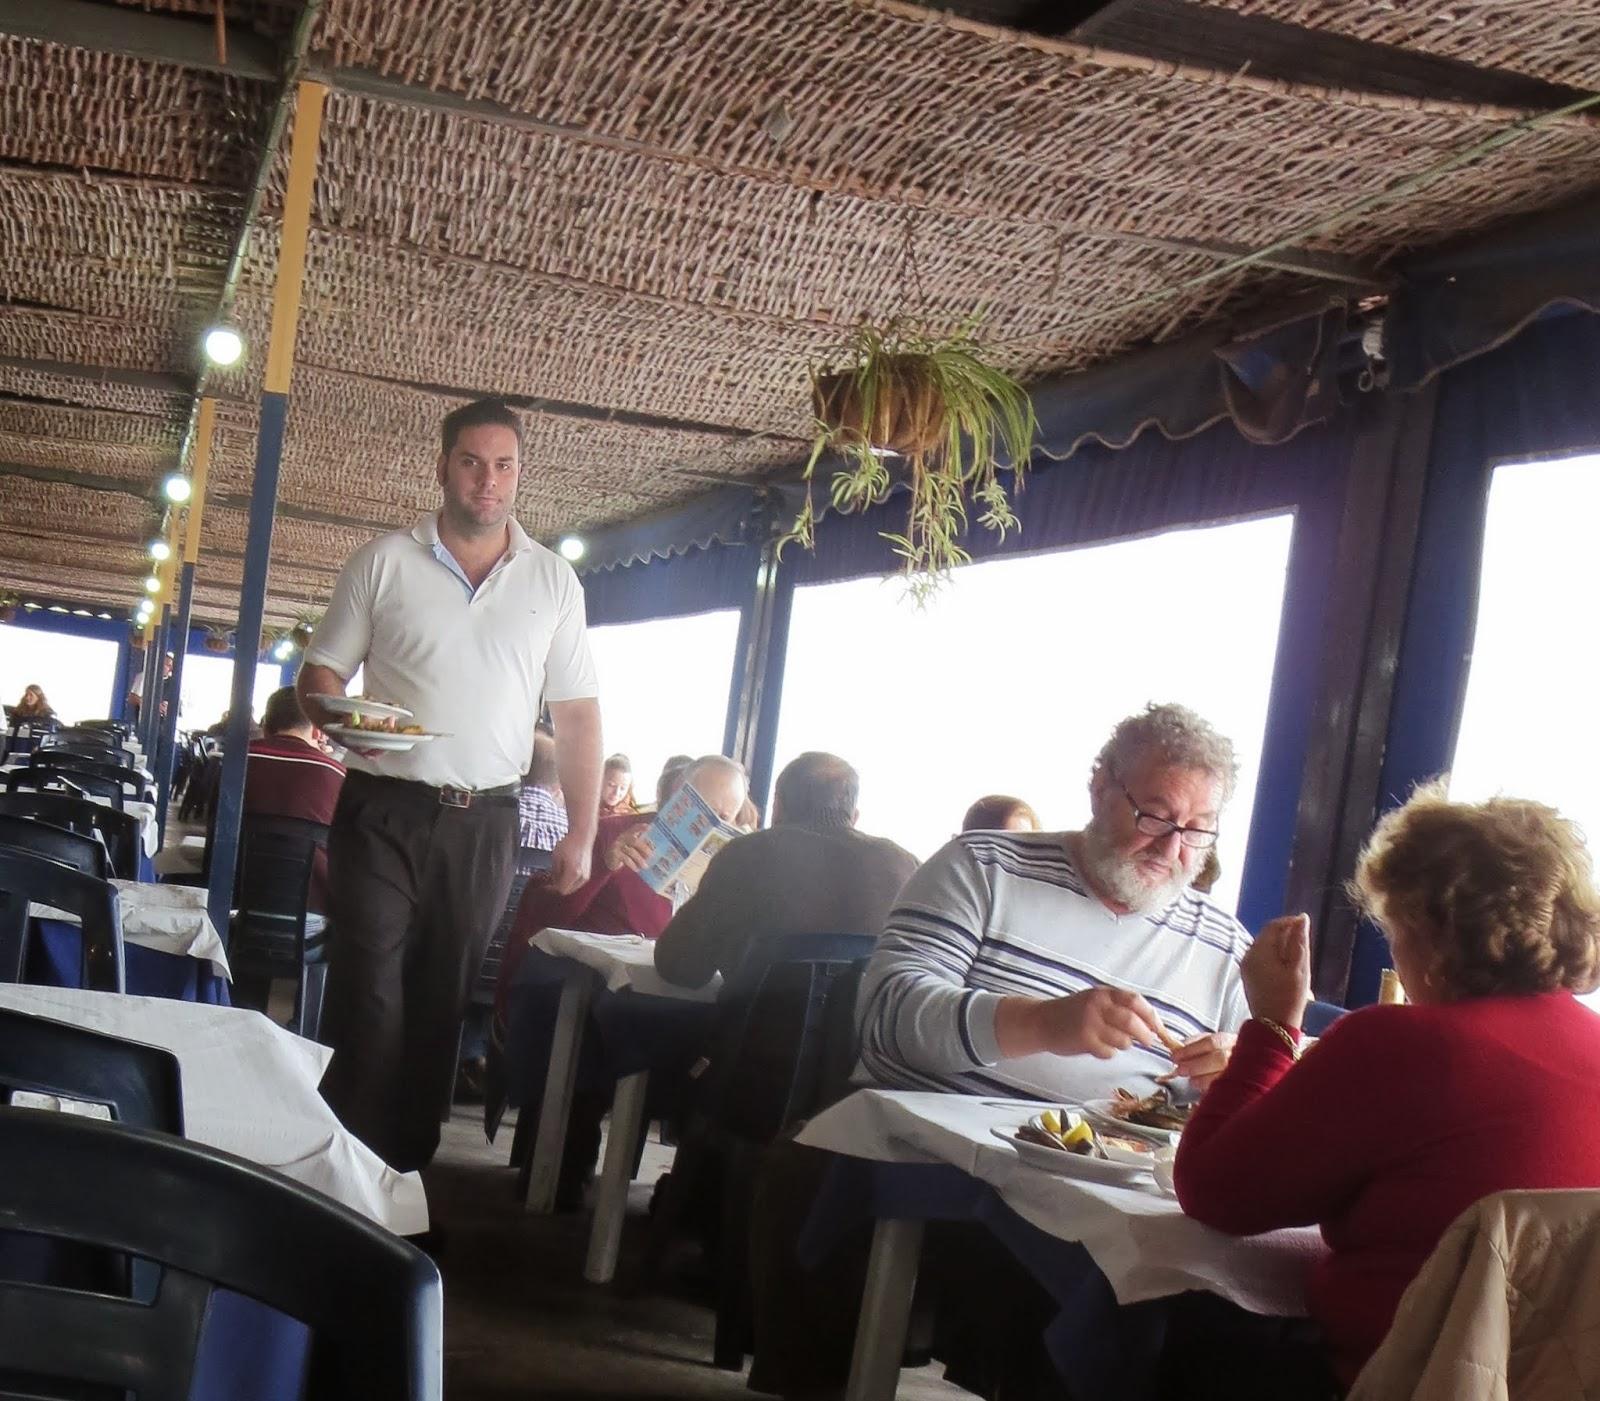 Operatic Waiter at Restaurante El Tintero in Málaga, Spain